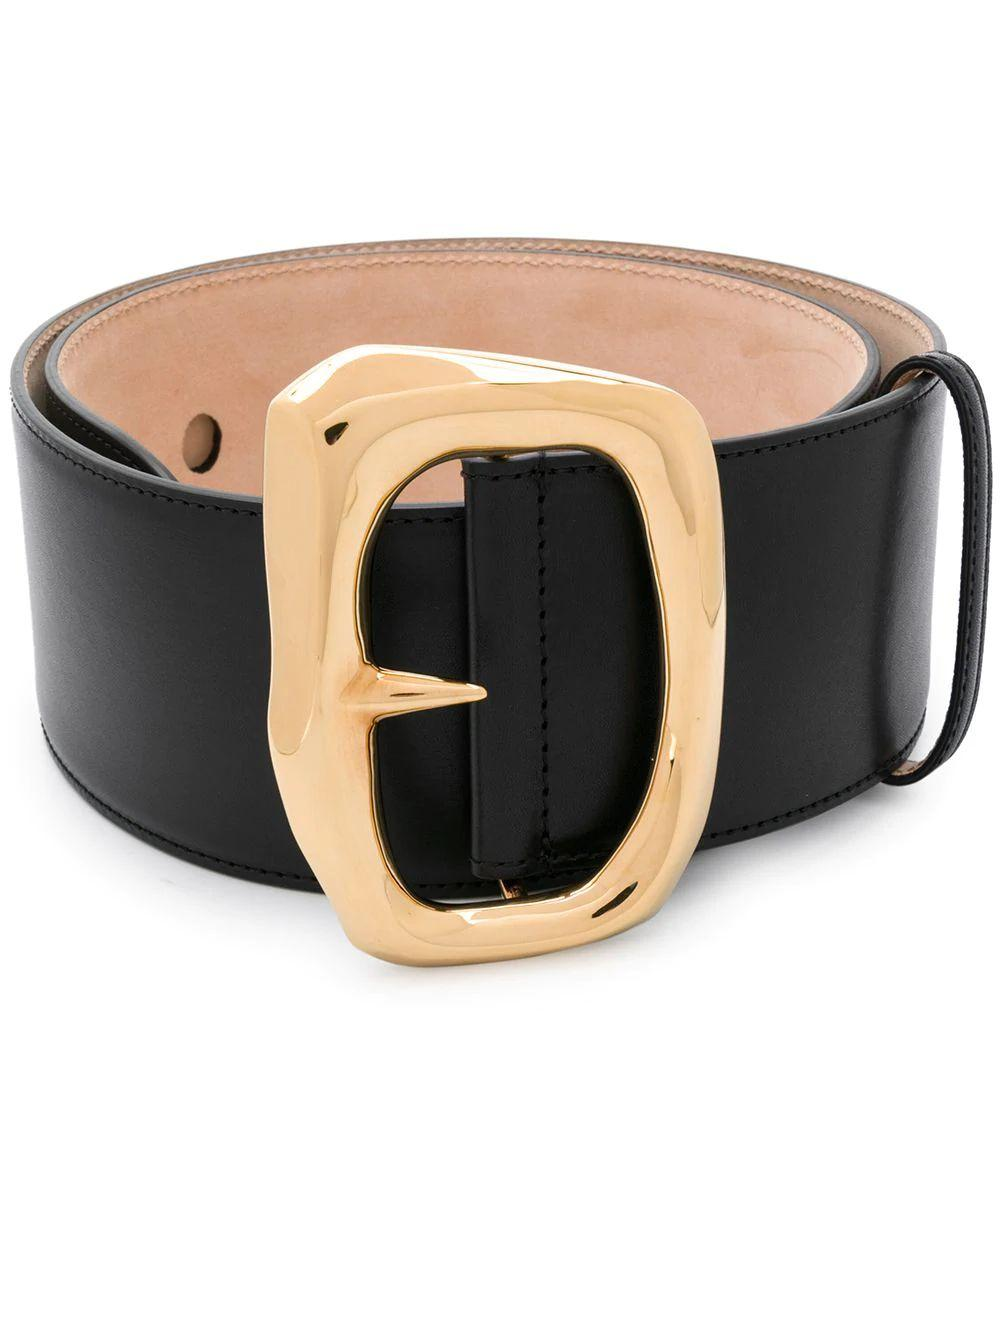 Molten Buckle Leather Belt Item # 6321251BR0M